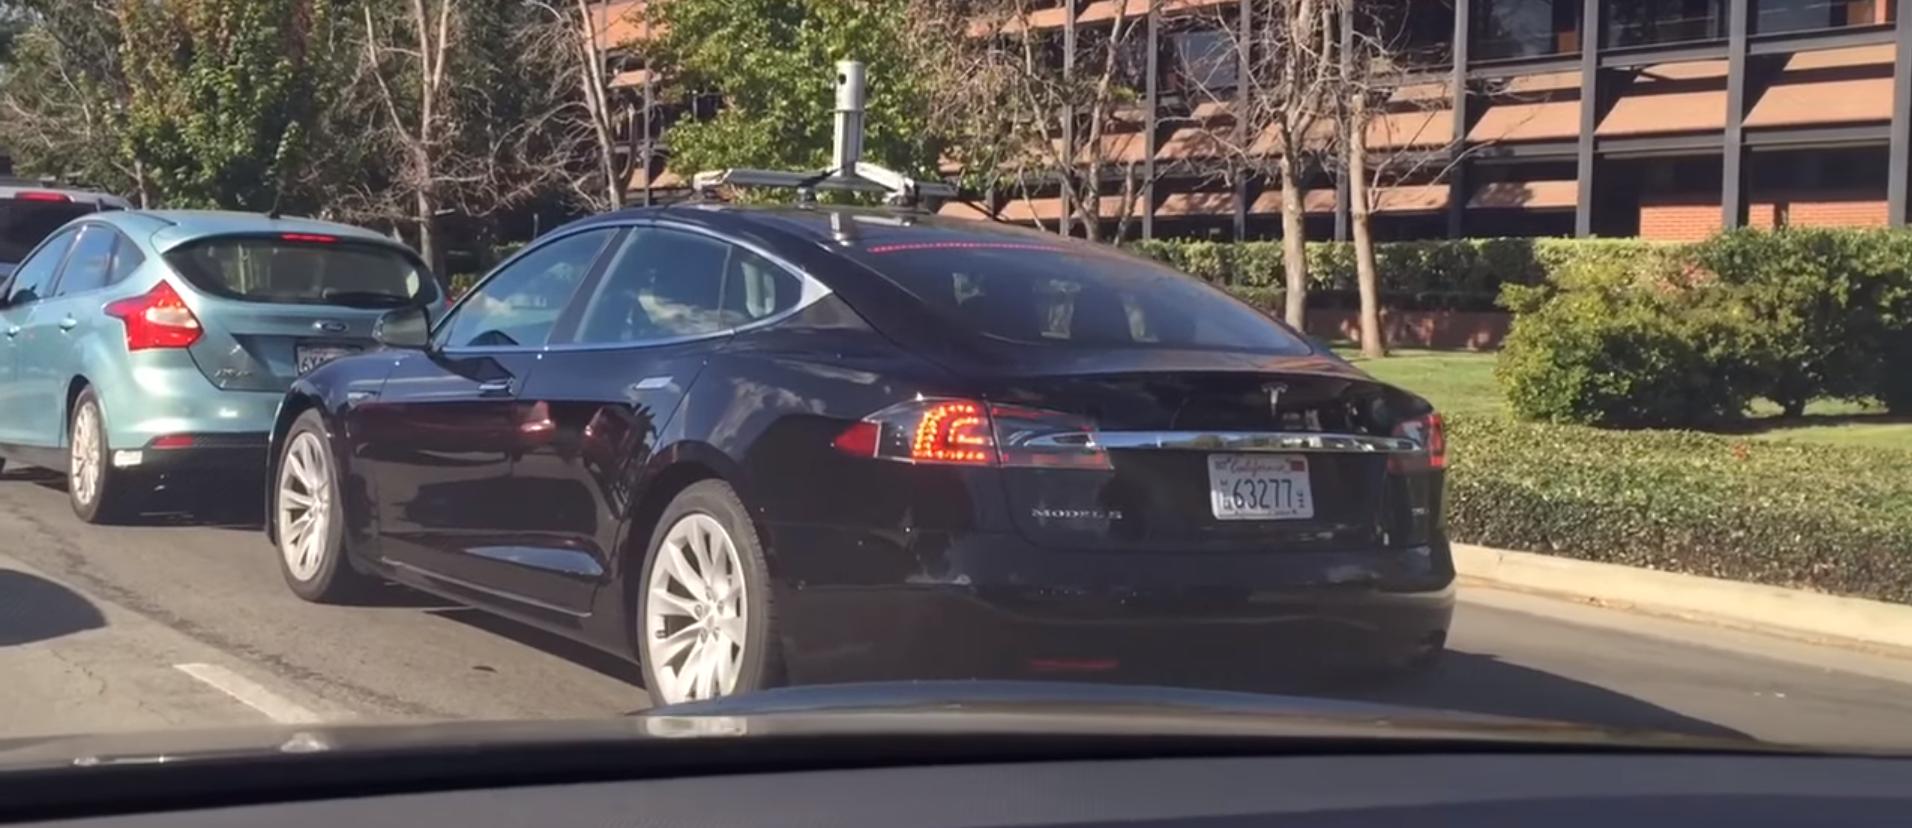 Tesla still has no plans to use LiDAR in consumer vehicles